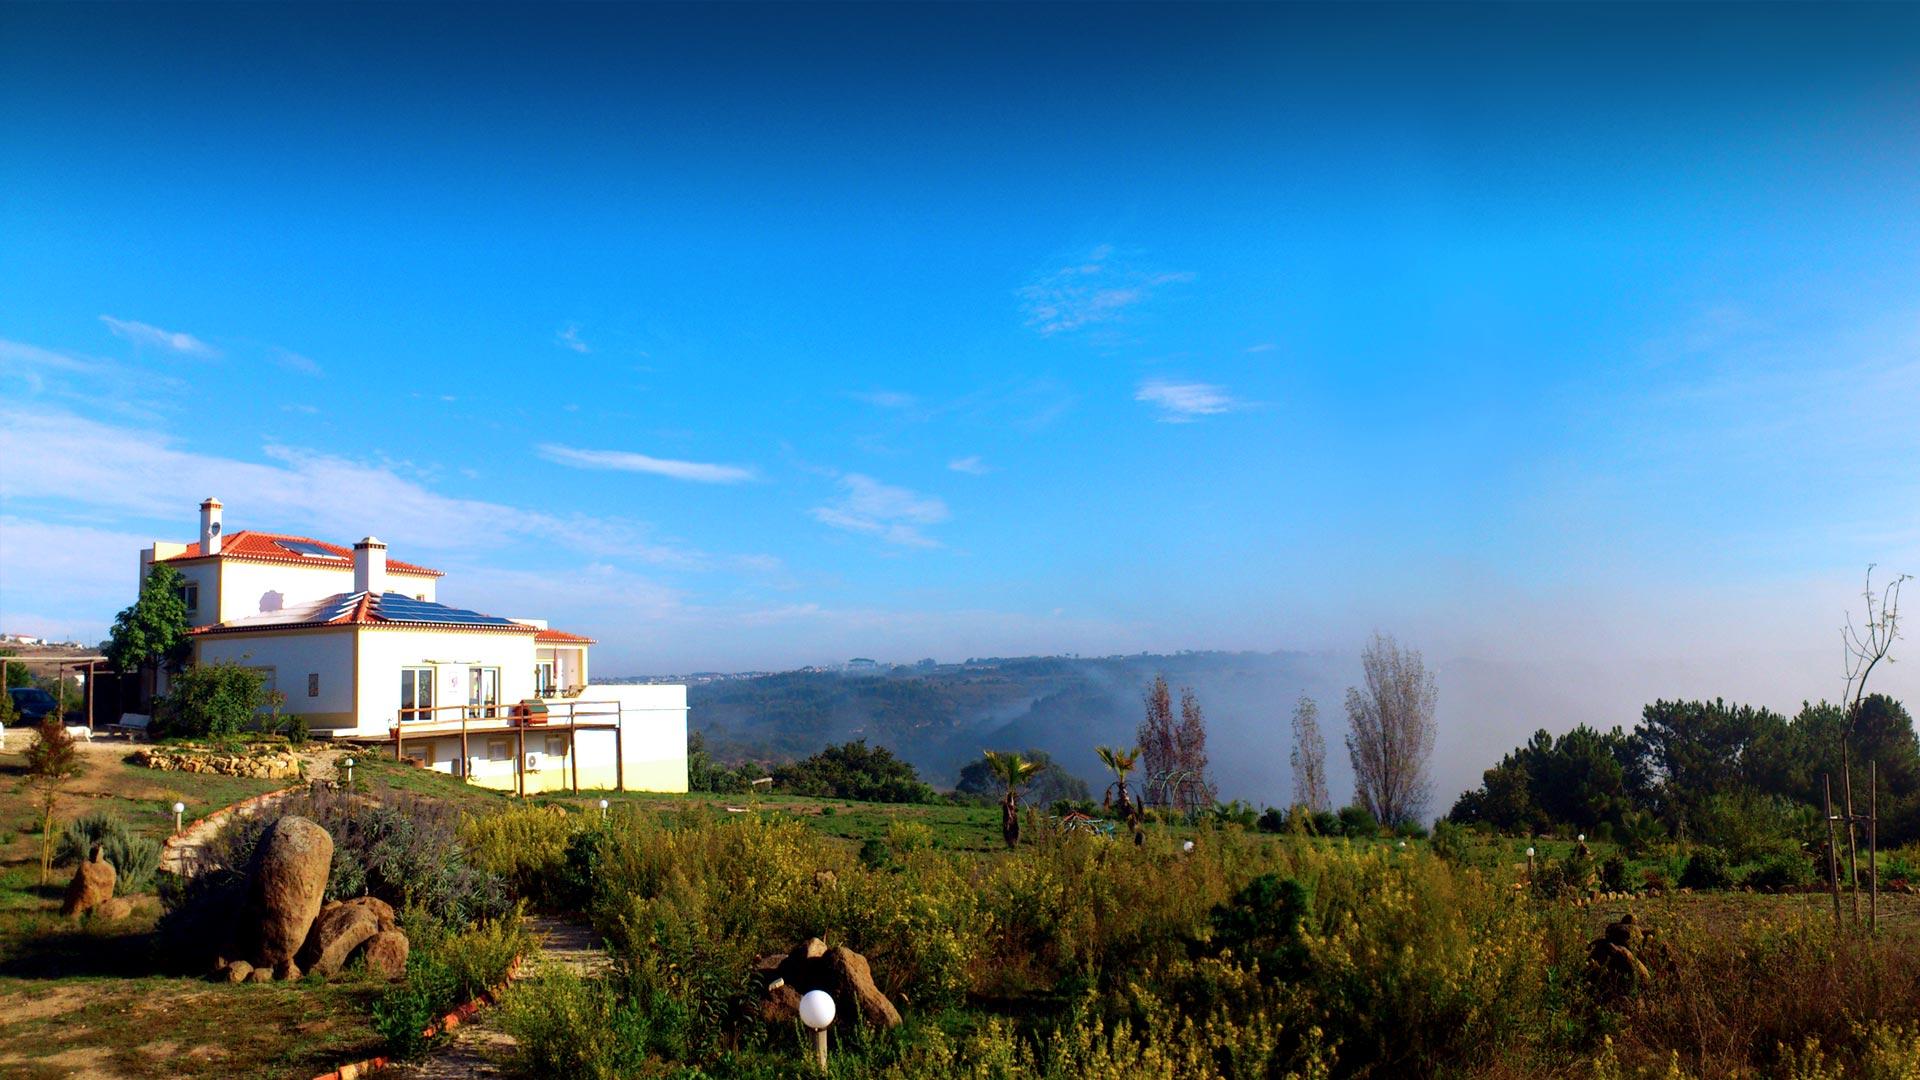 Quinta do Rajo